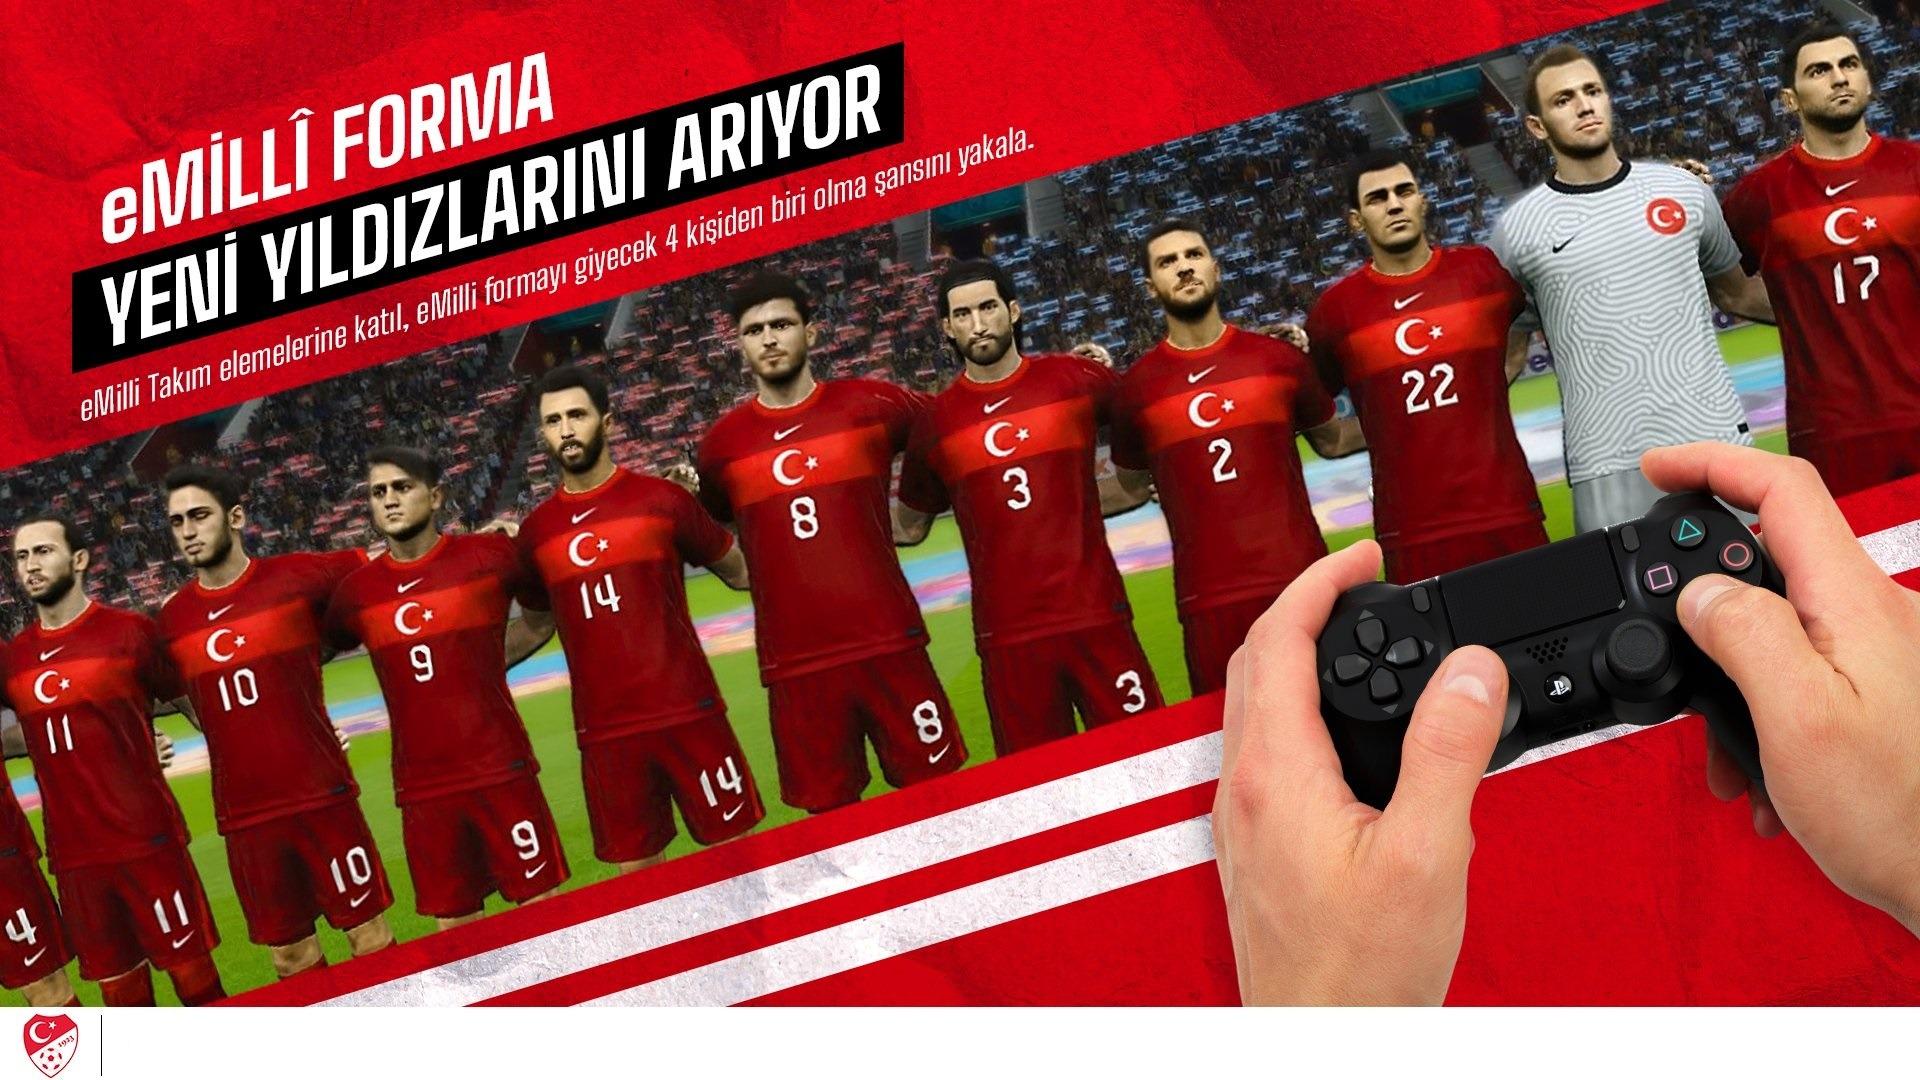 eMilli Takım FIFA ve PES seçmeleri